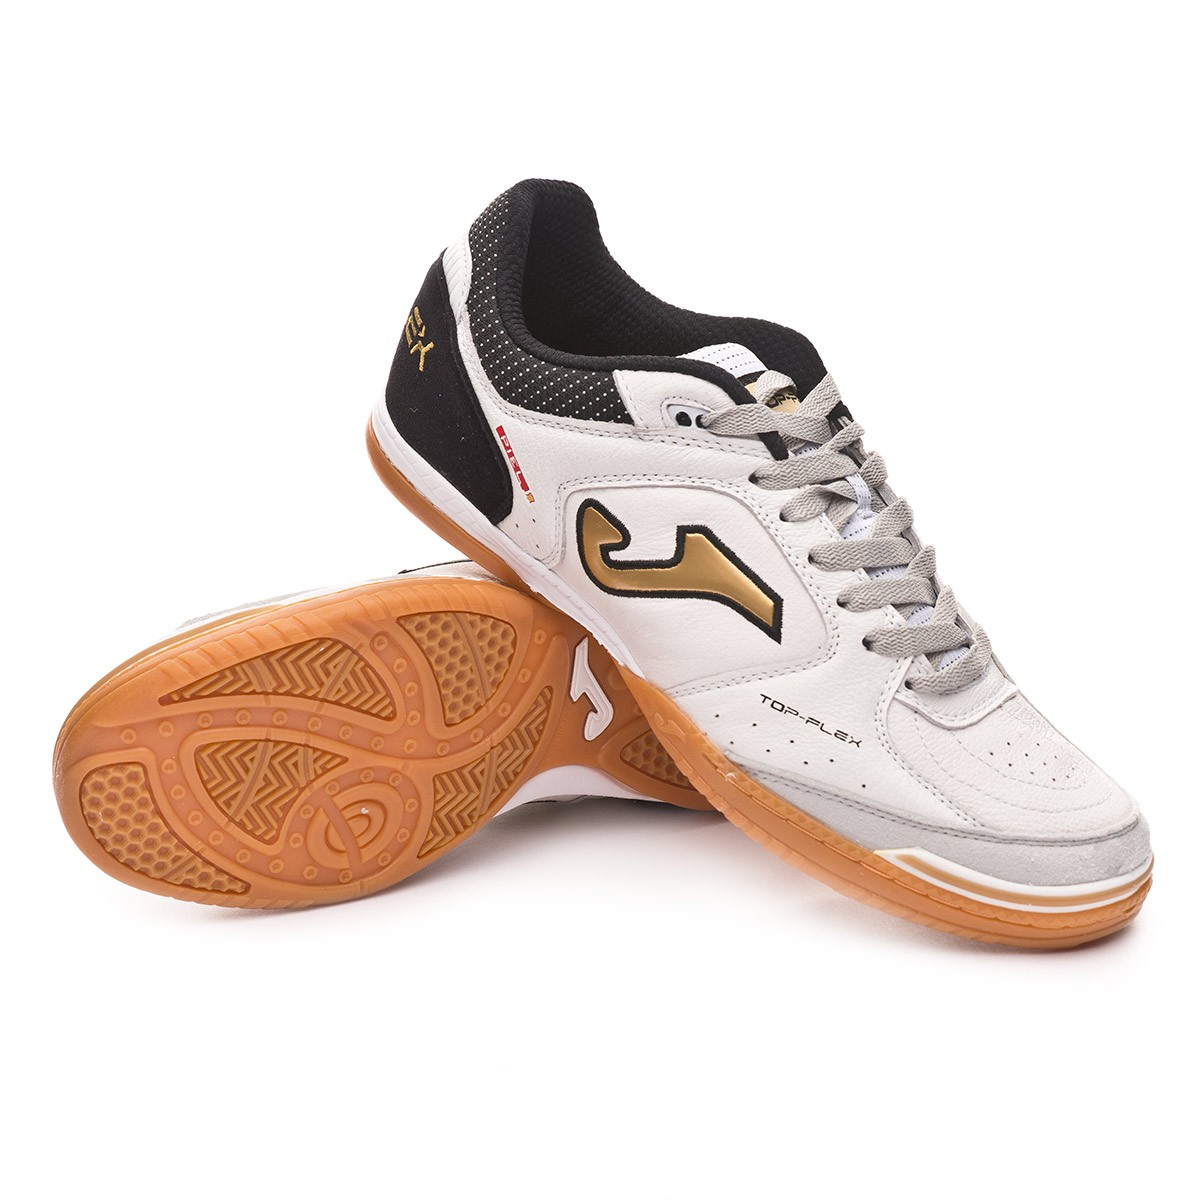 6e3b19f2430e Futsal Boot Joma Top Flex Exclusiva White-Gold-Black - Football store  Fútbol Emotion